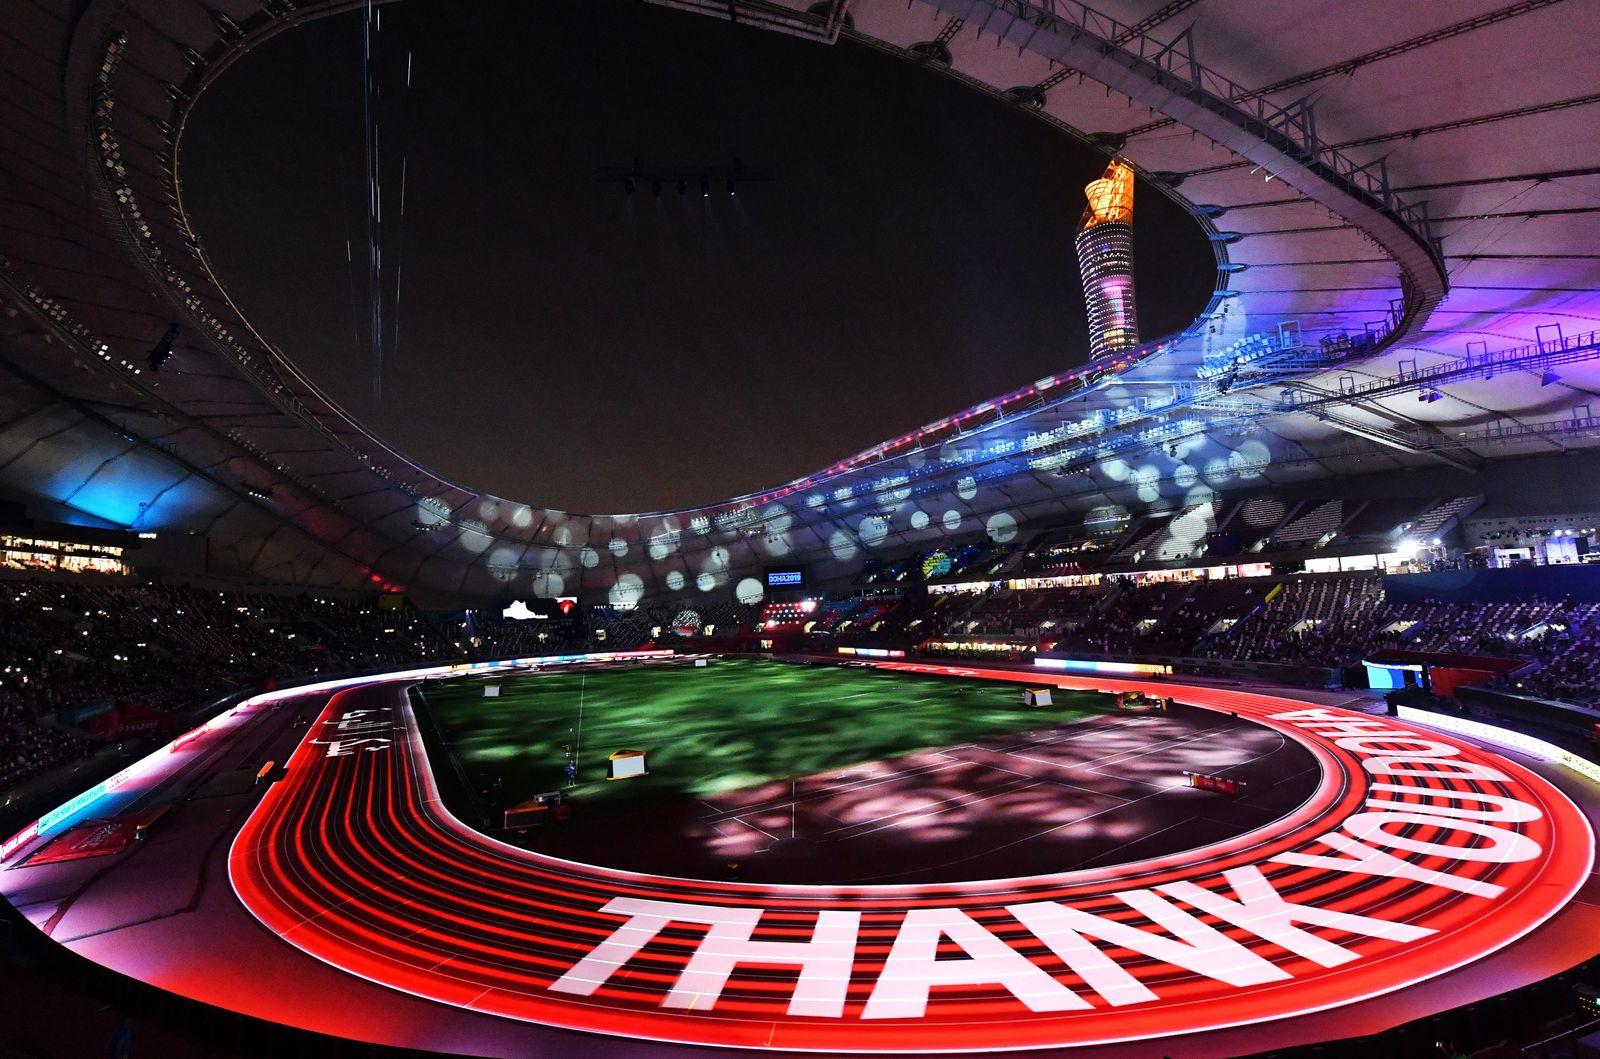 Katar/ Leichtathletik WM